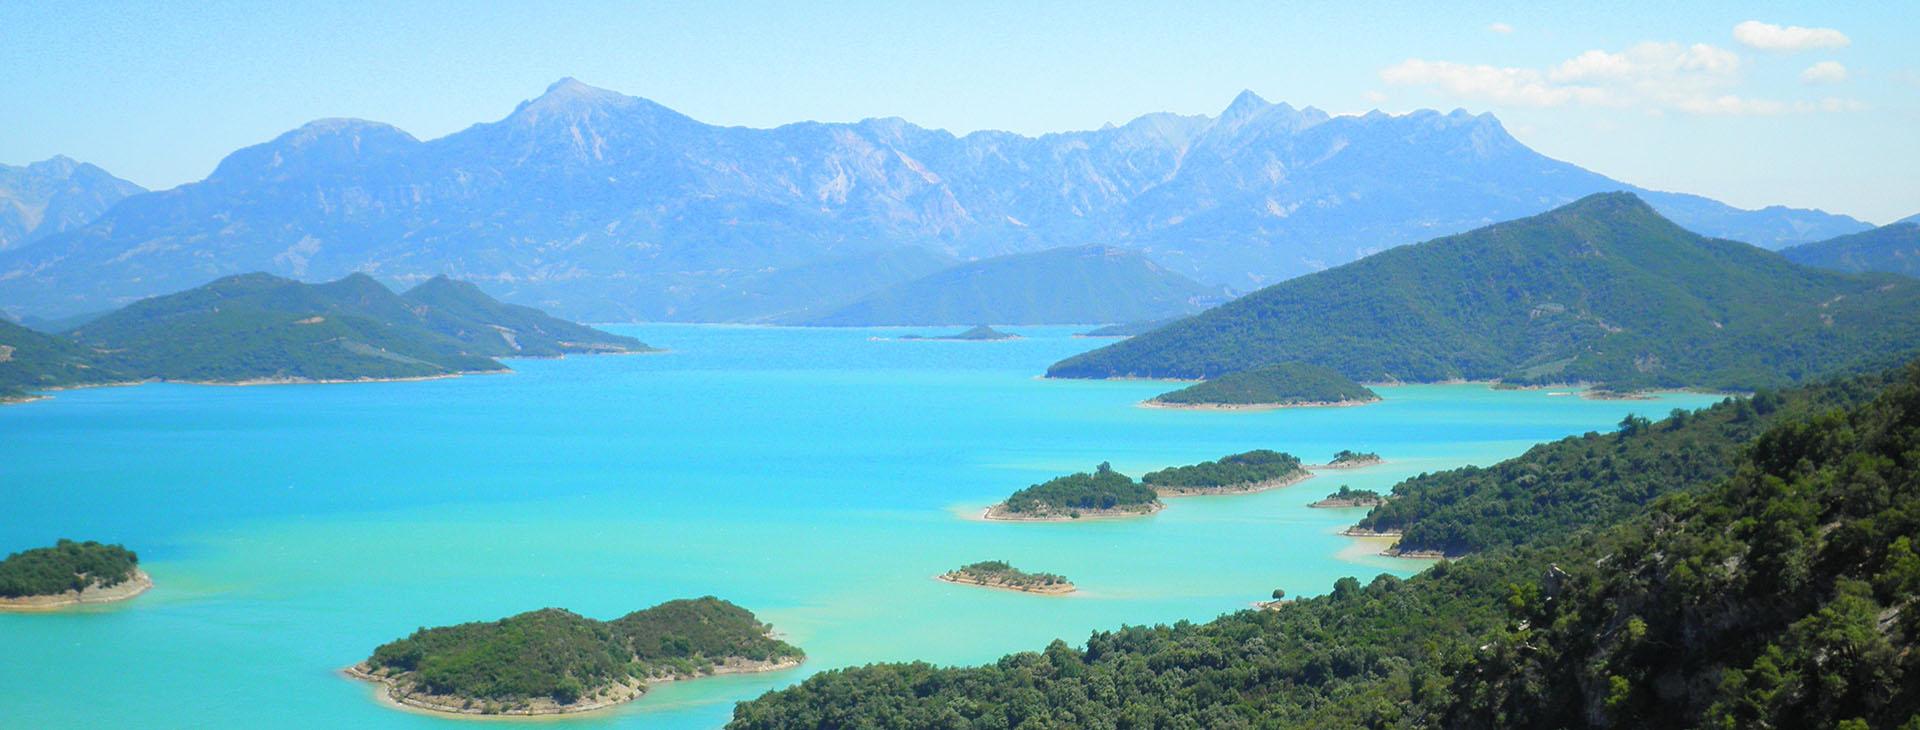 Kremasta lake, Evritania